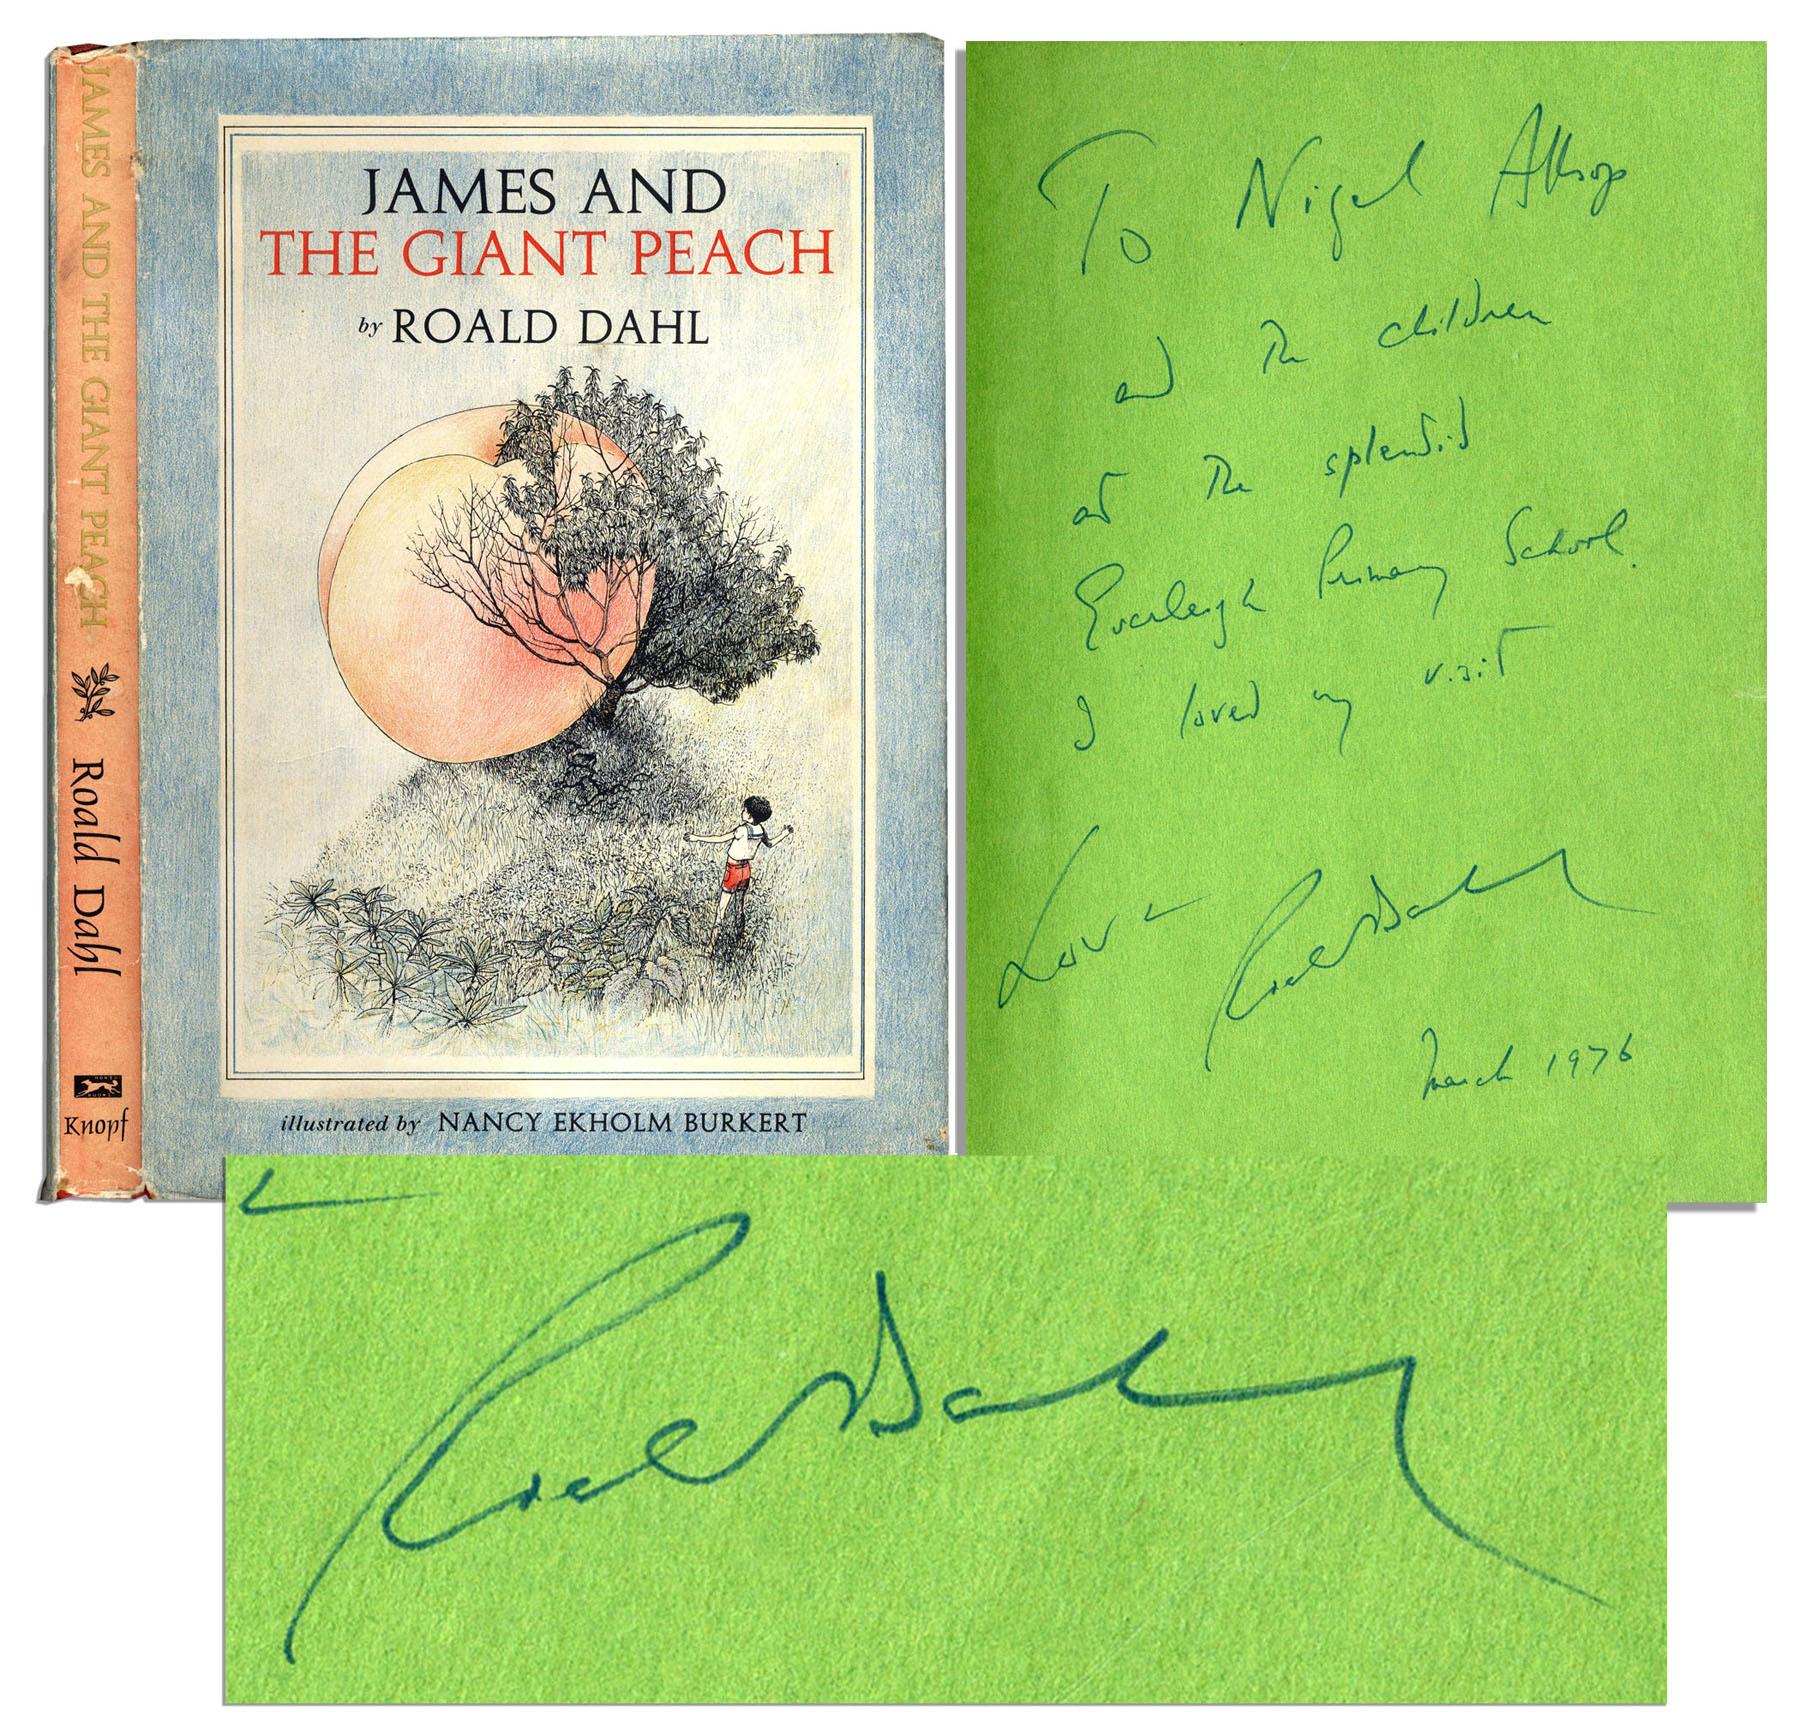 Auciton Sell A Roald Dahl James And The Giant Peach